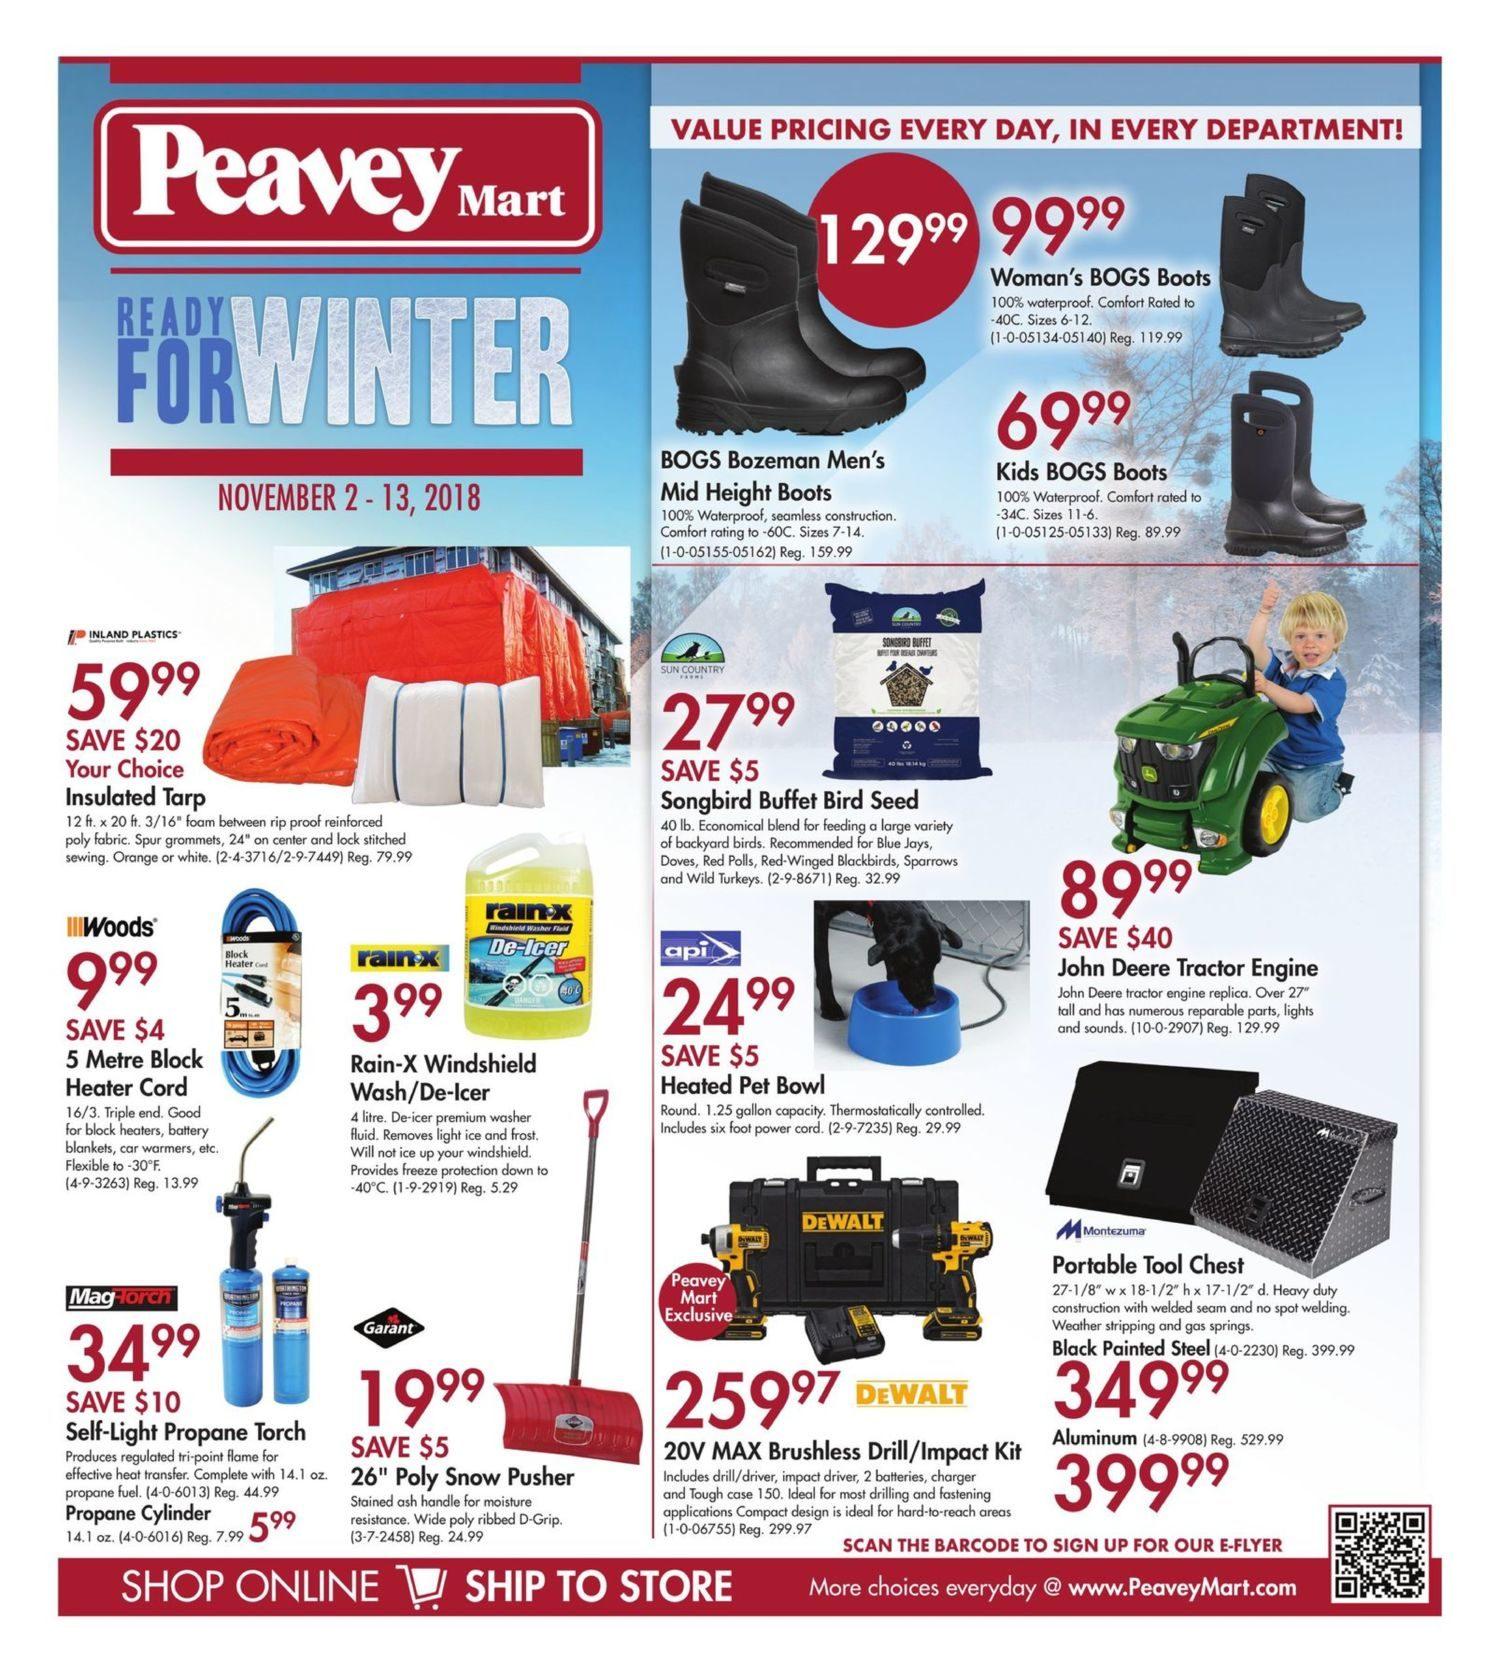 Peaveymart Weekly Flyer Ready For Winter Nov 2 13 Redflagdeals Com